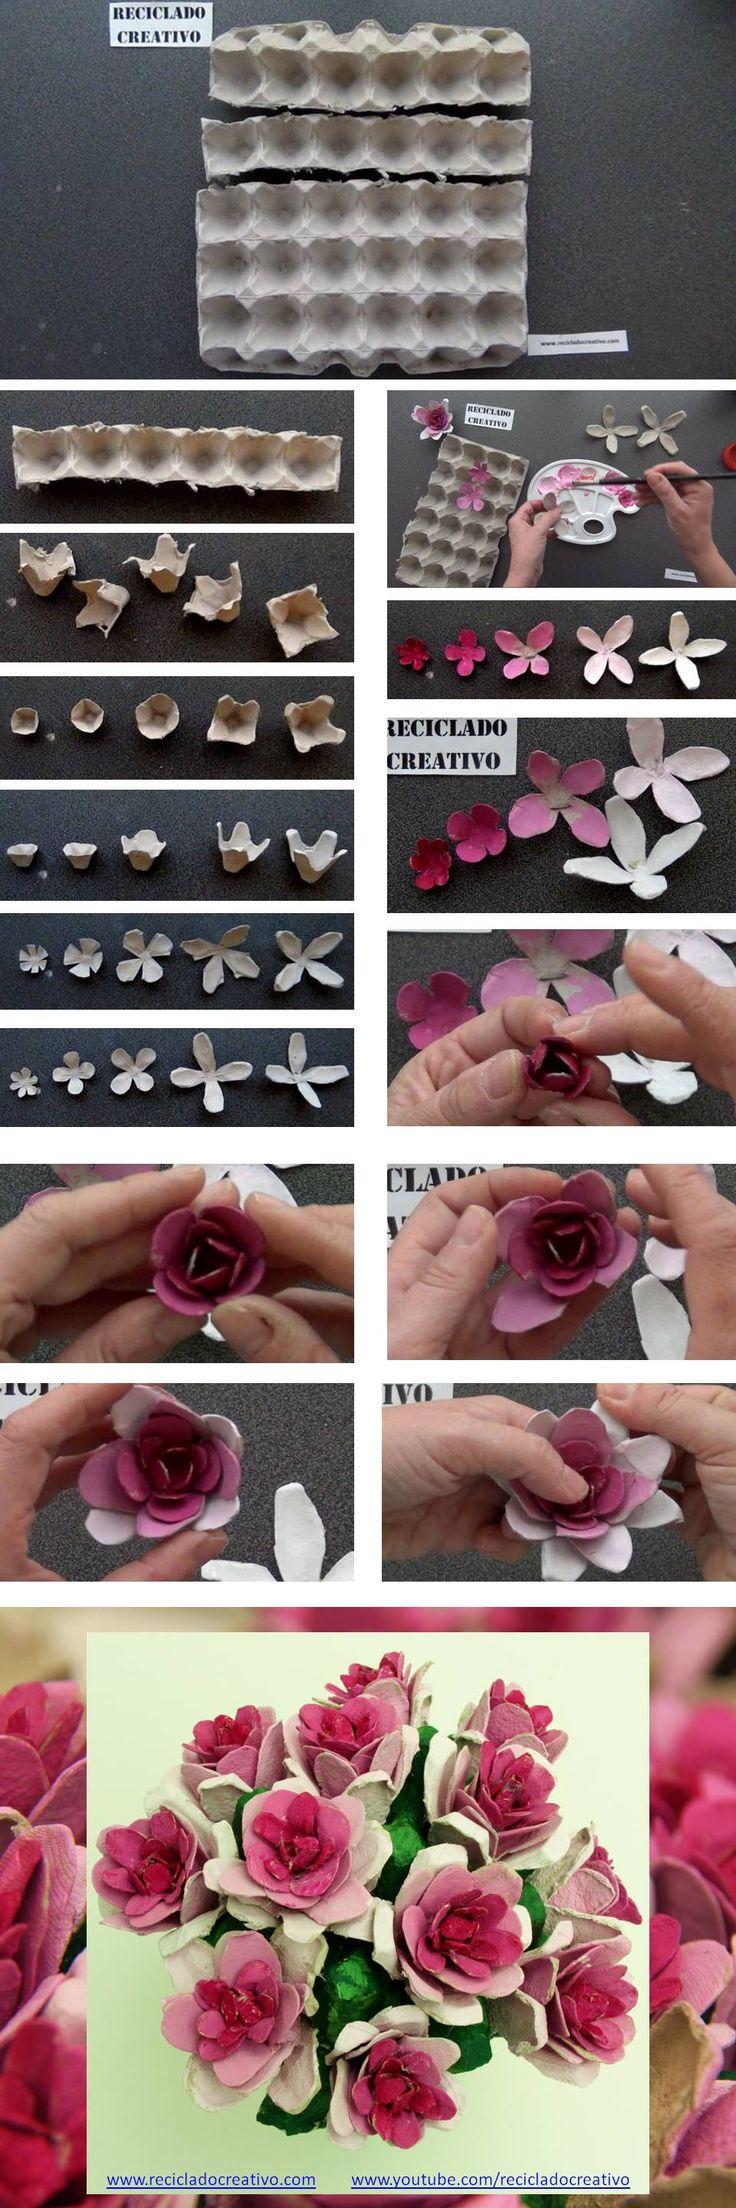 Infographic cómo hacer flores con hueveras de cartón https://www.youtube.com/watch?v=8450l1XT6Ww